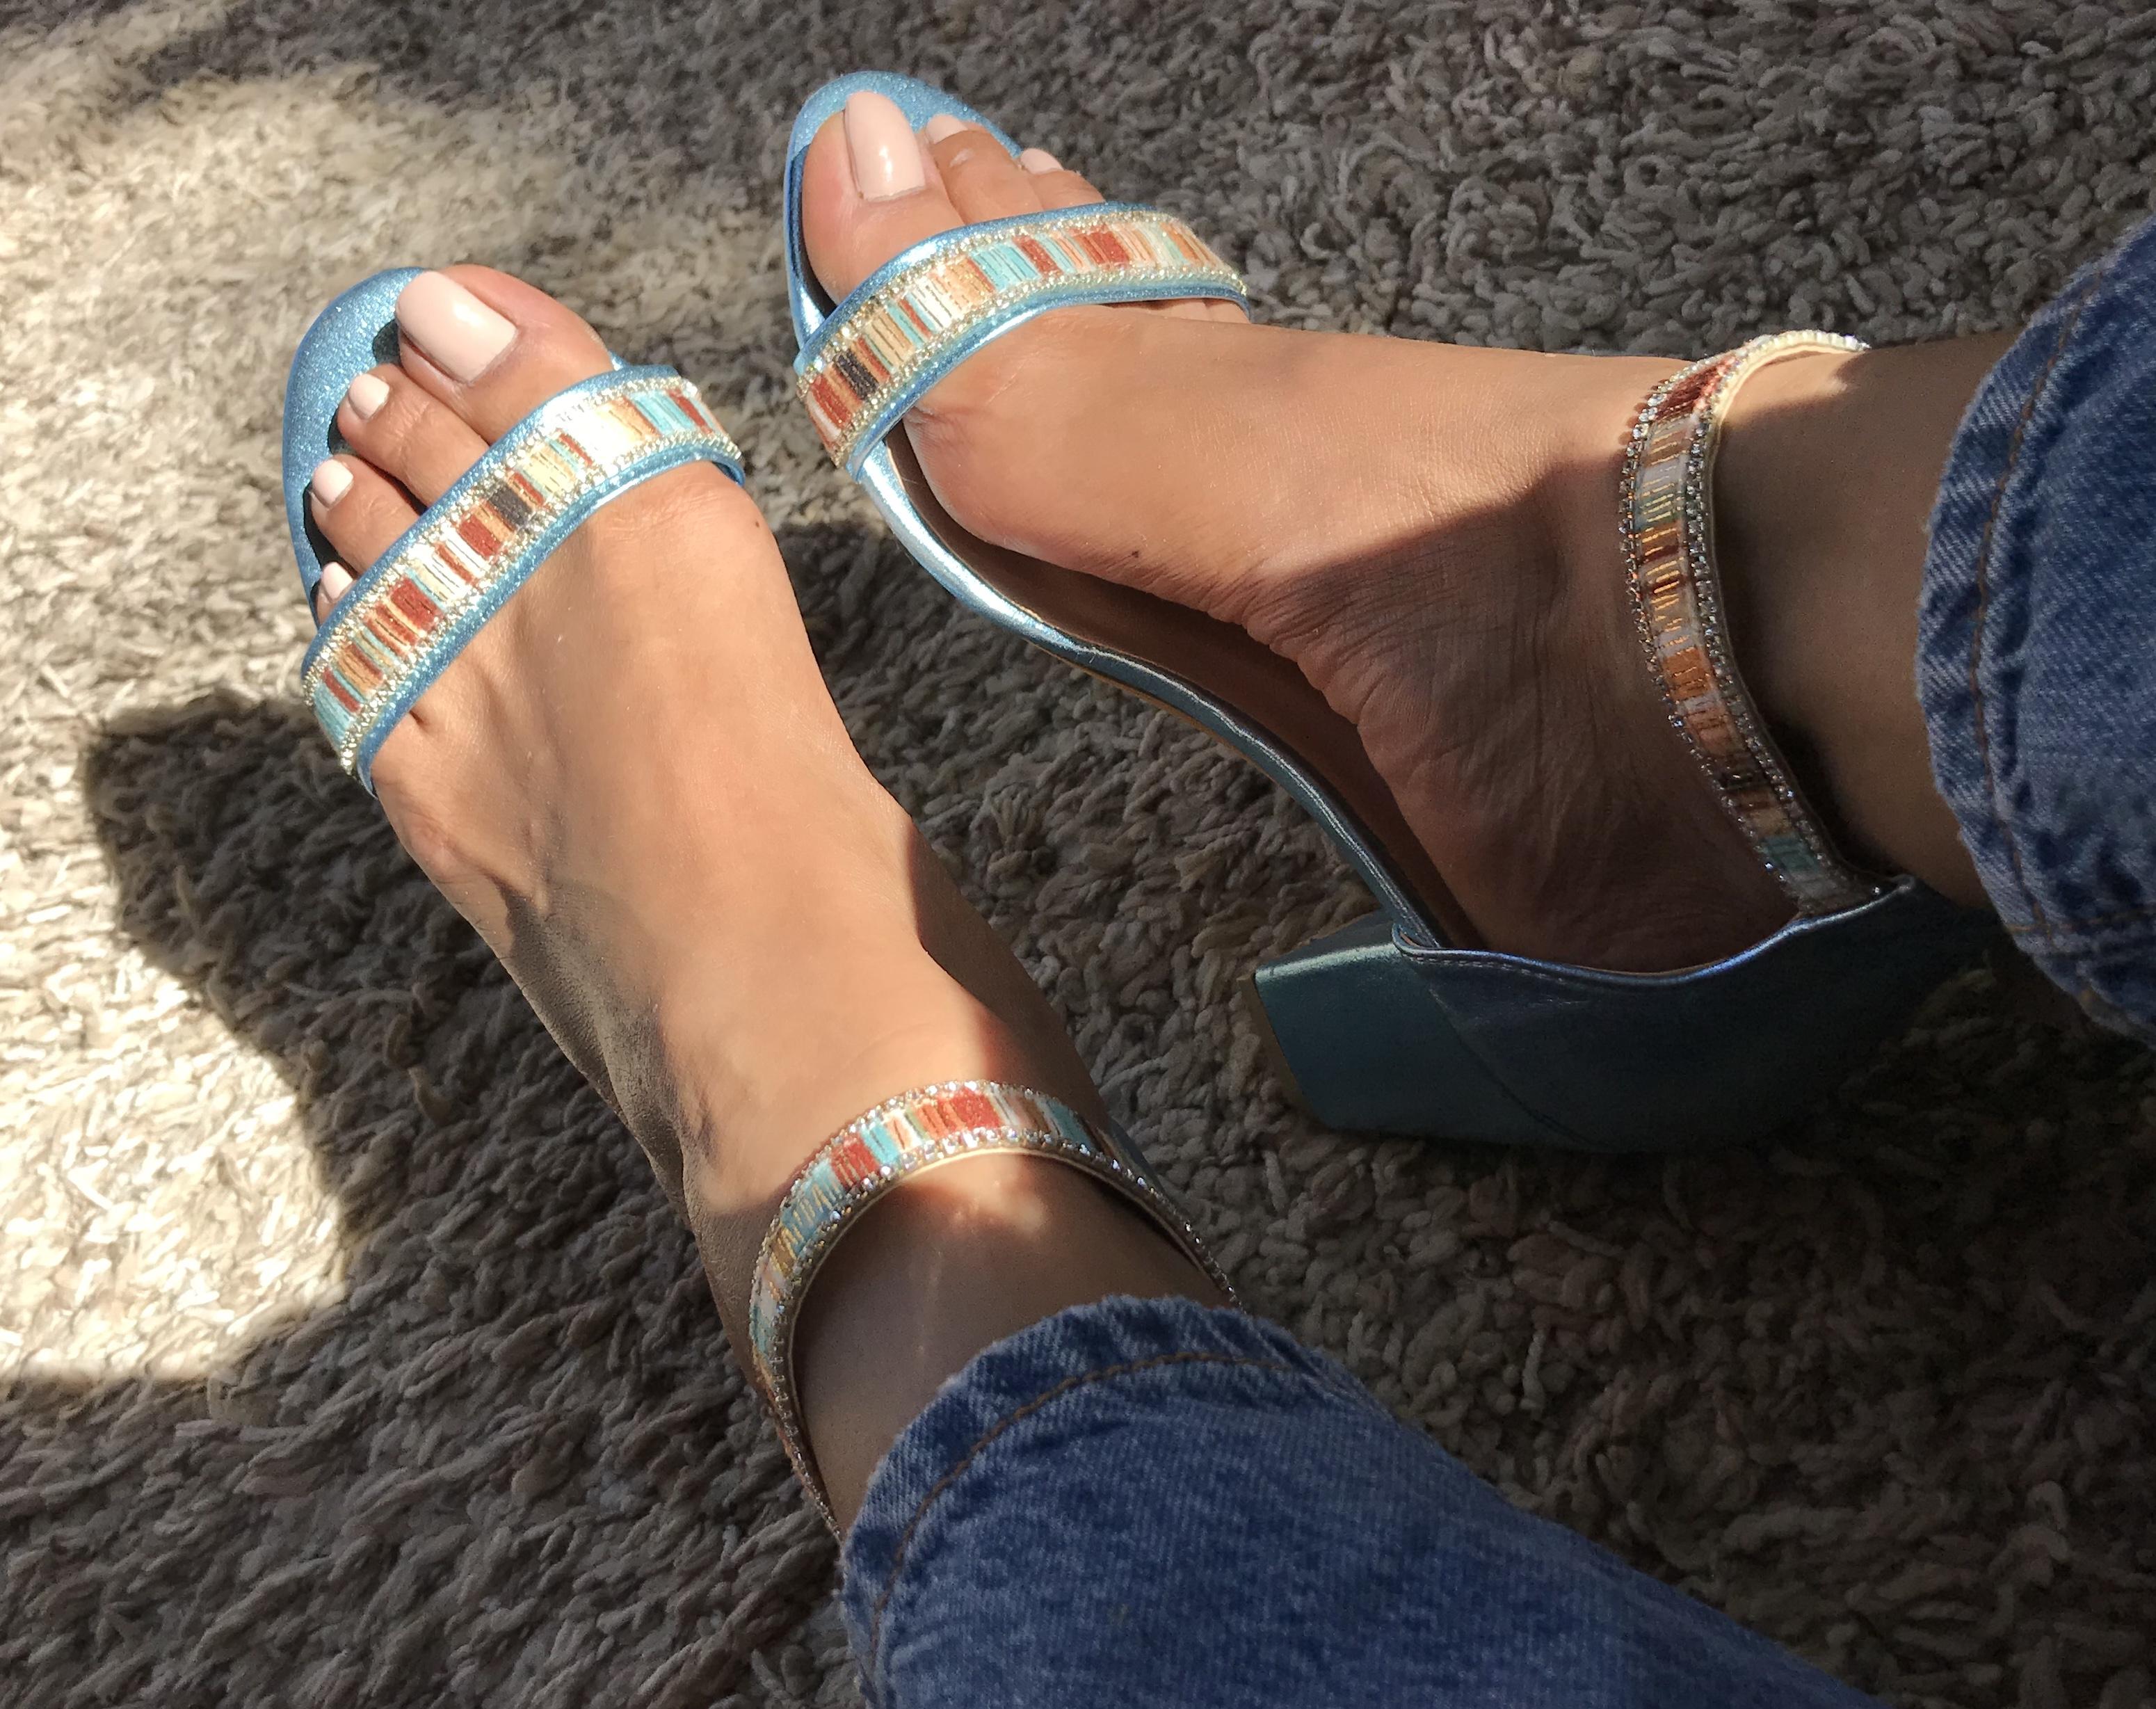 Sandals Leather light blue with velvet strass & heels